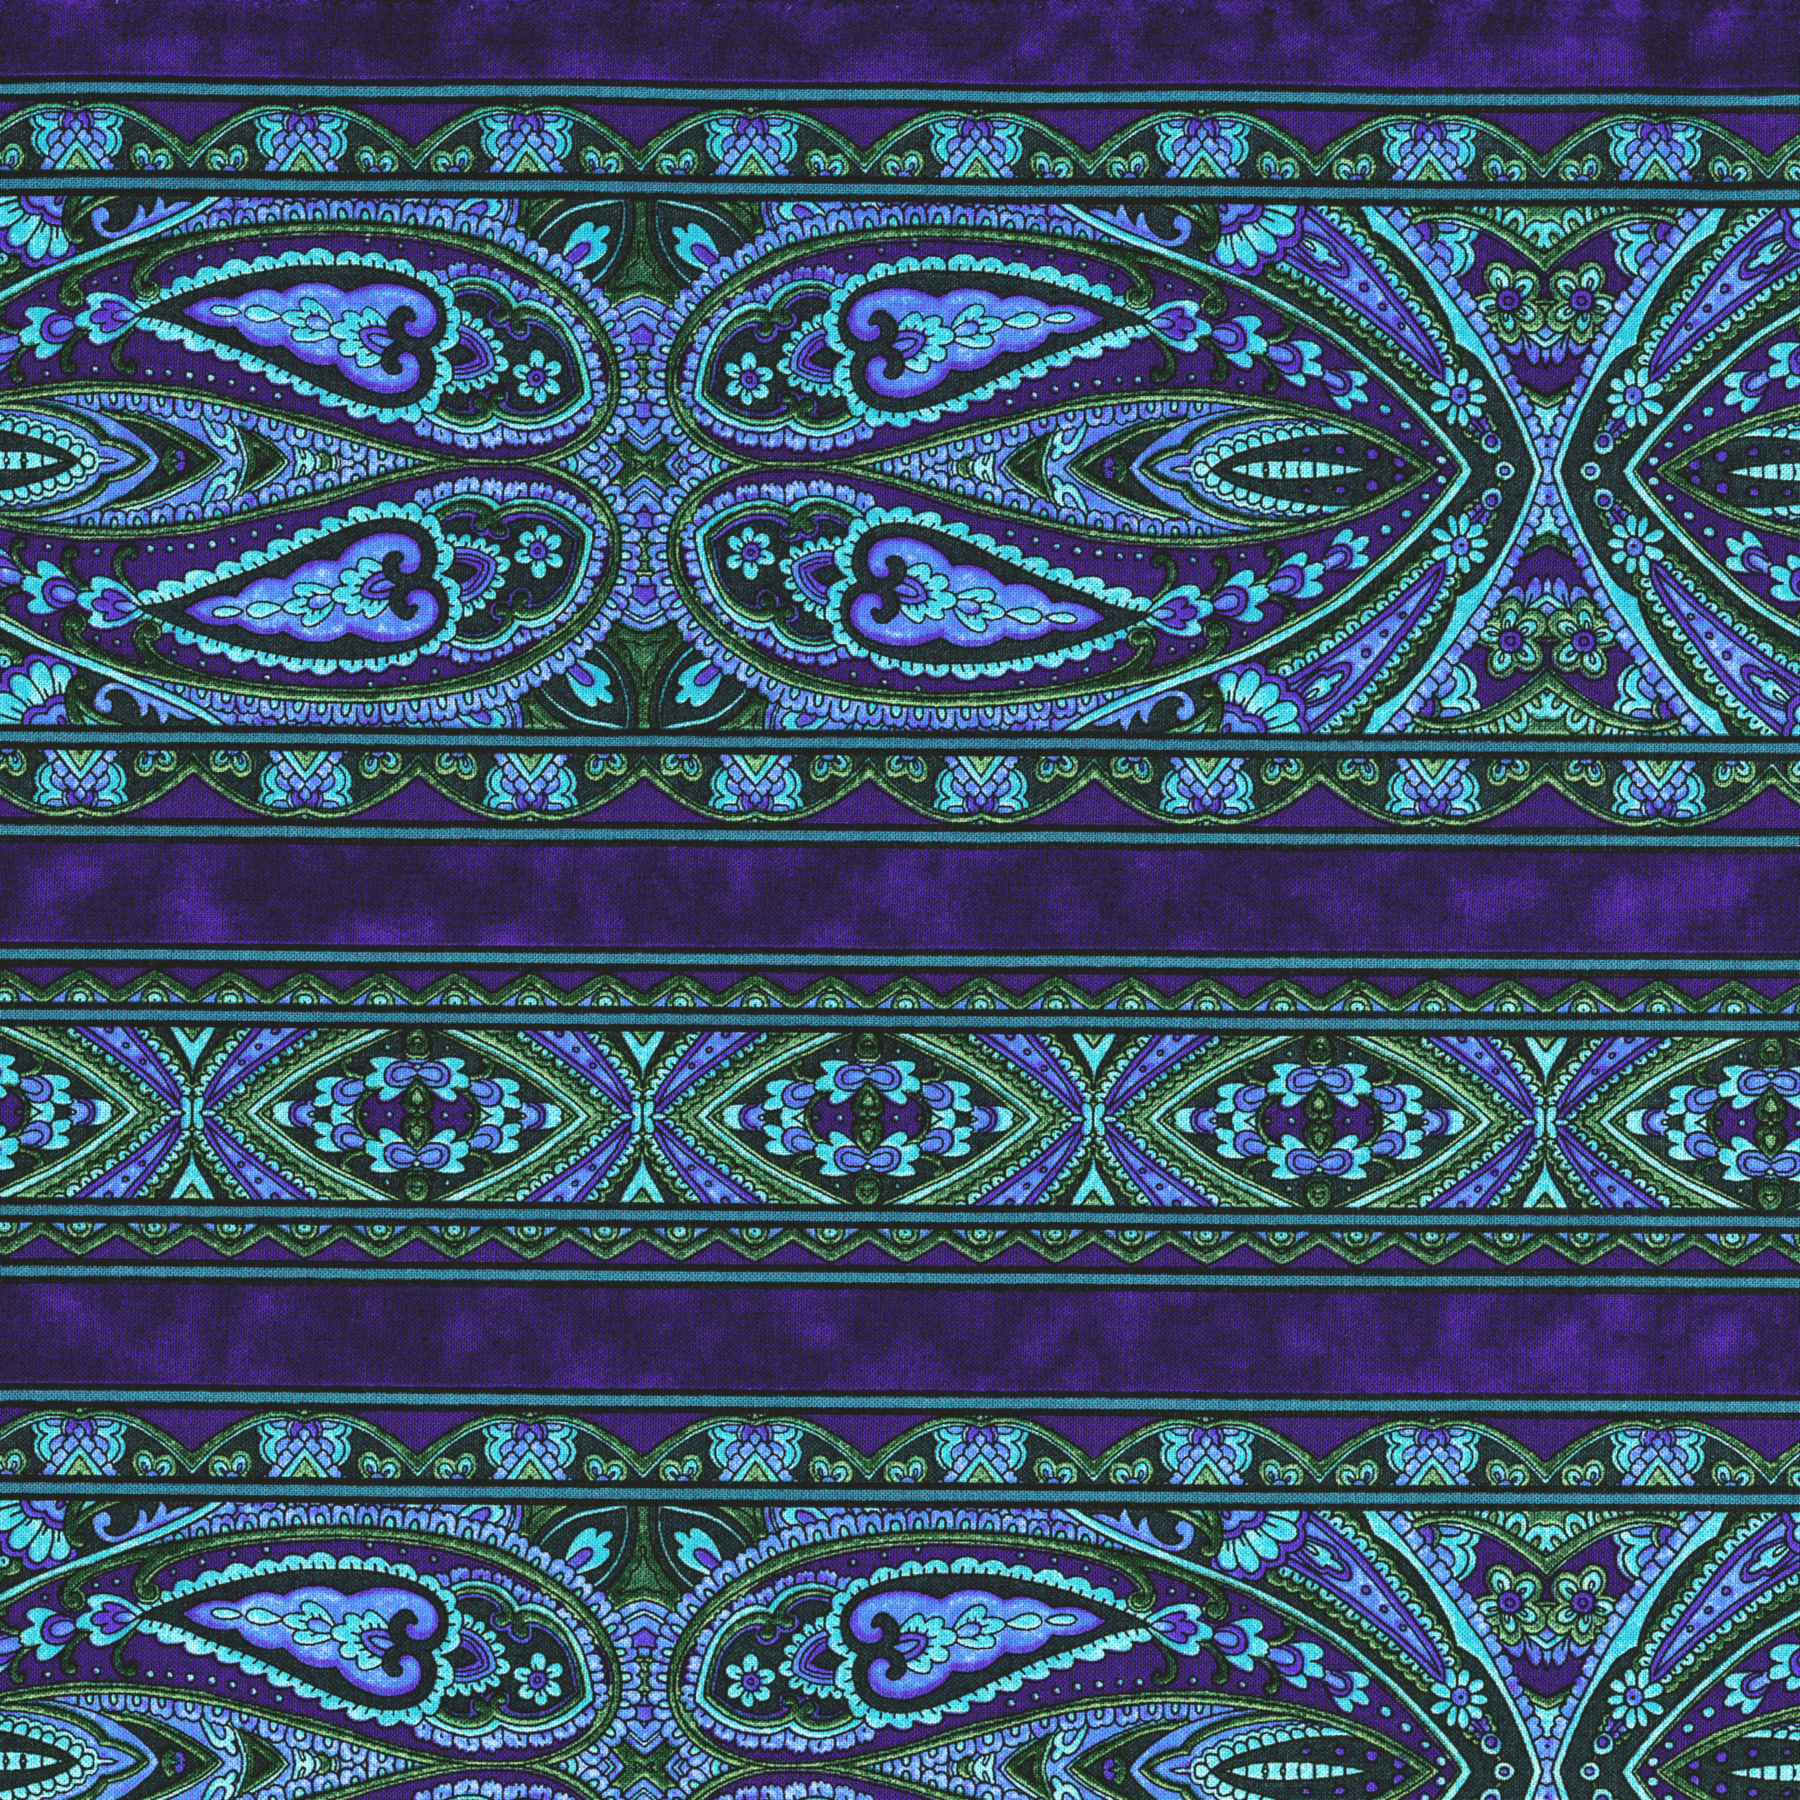 2795-003 CASABLANCA BORDER BLUE